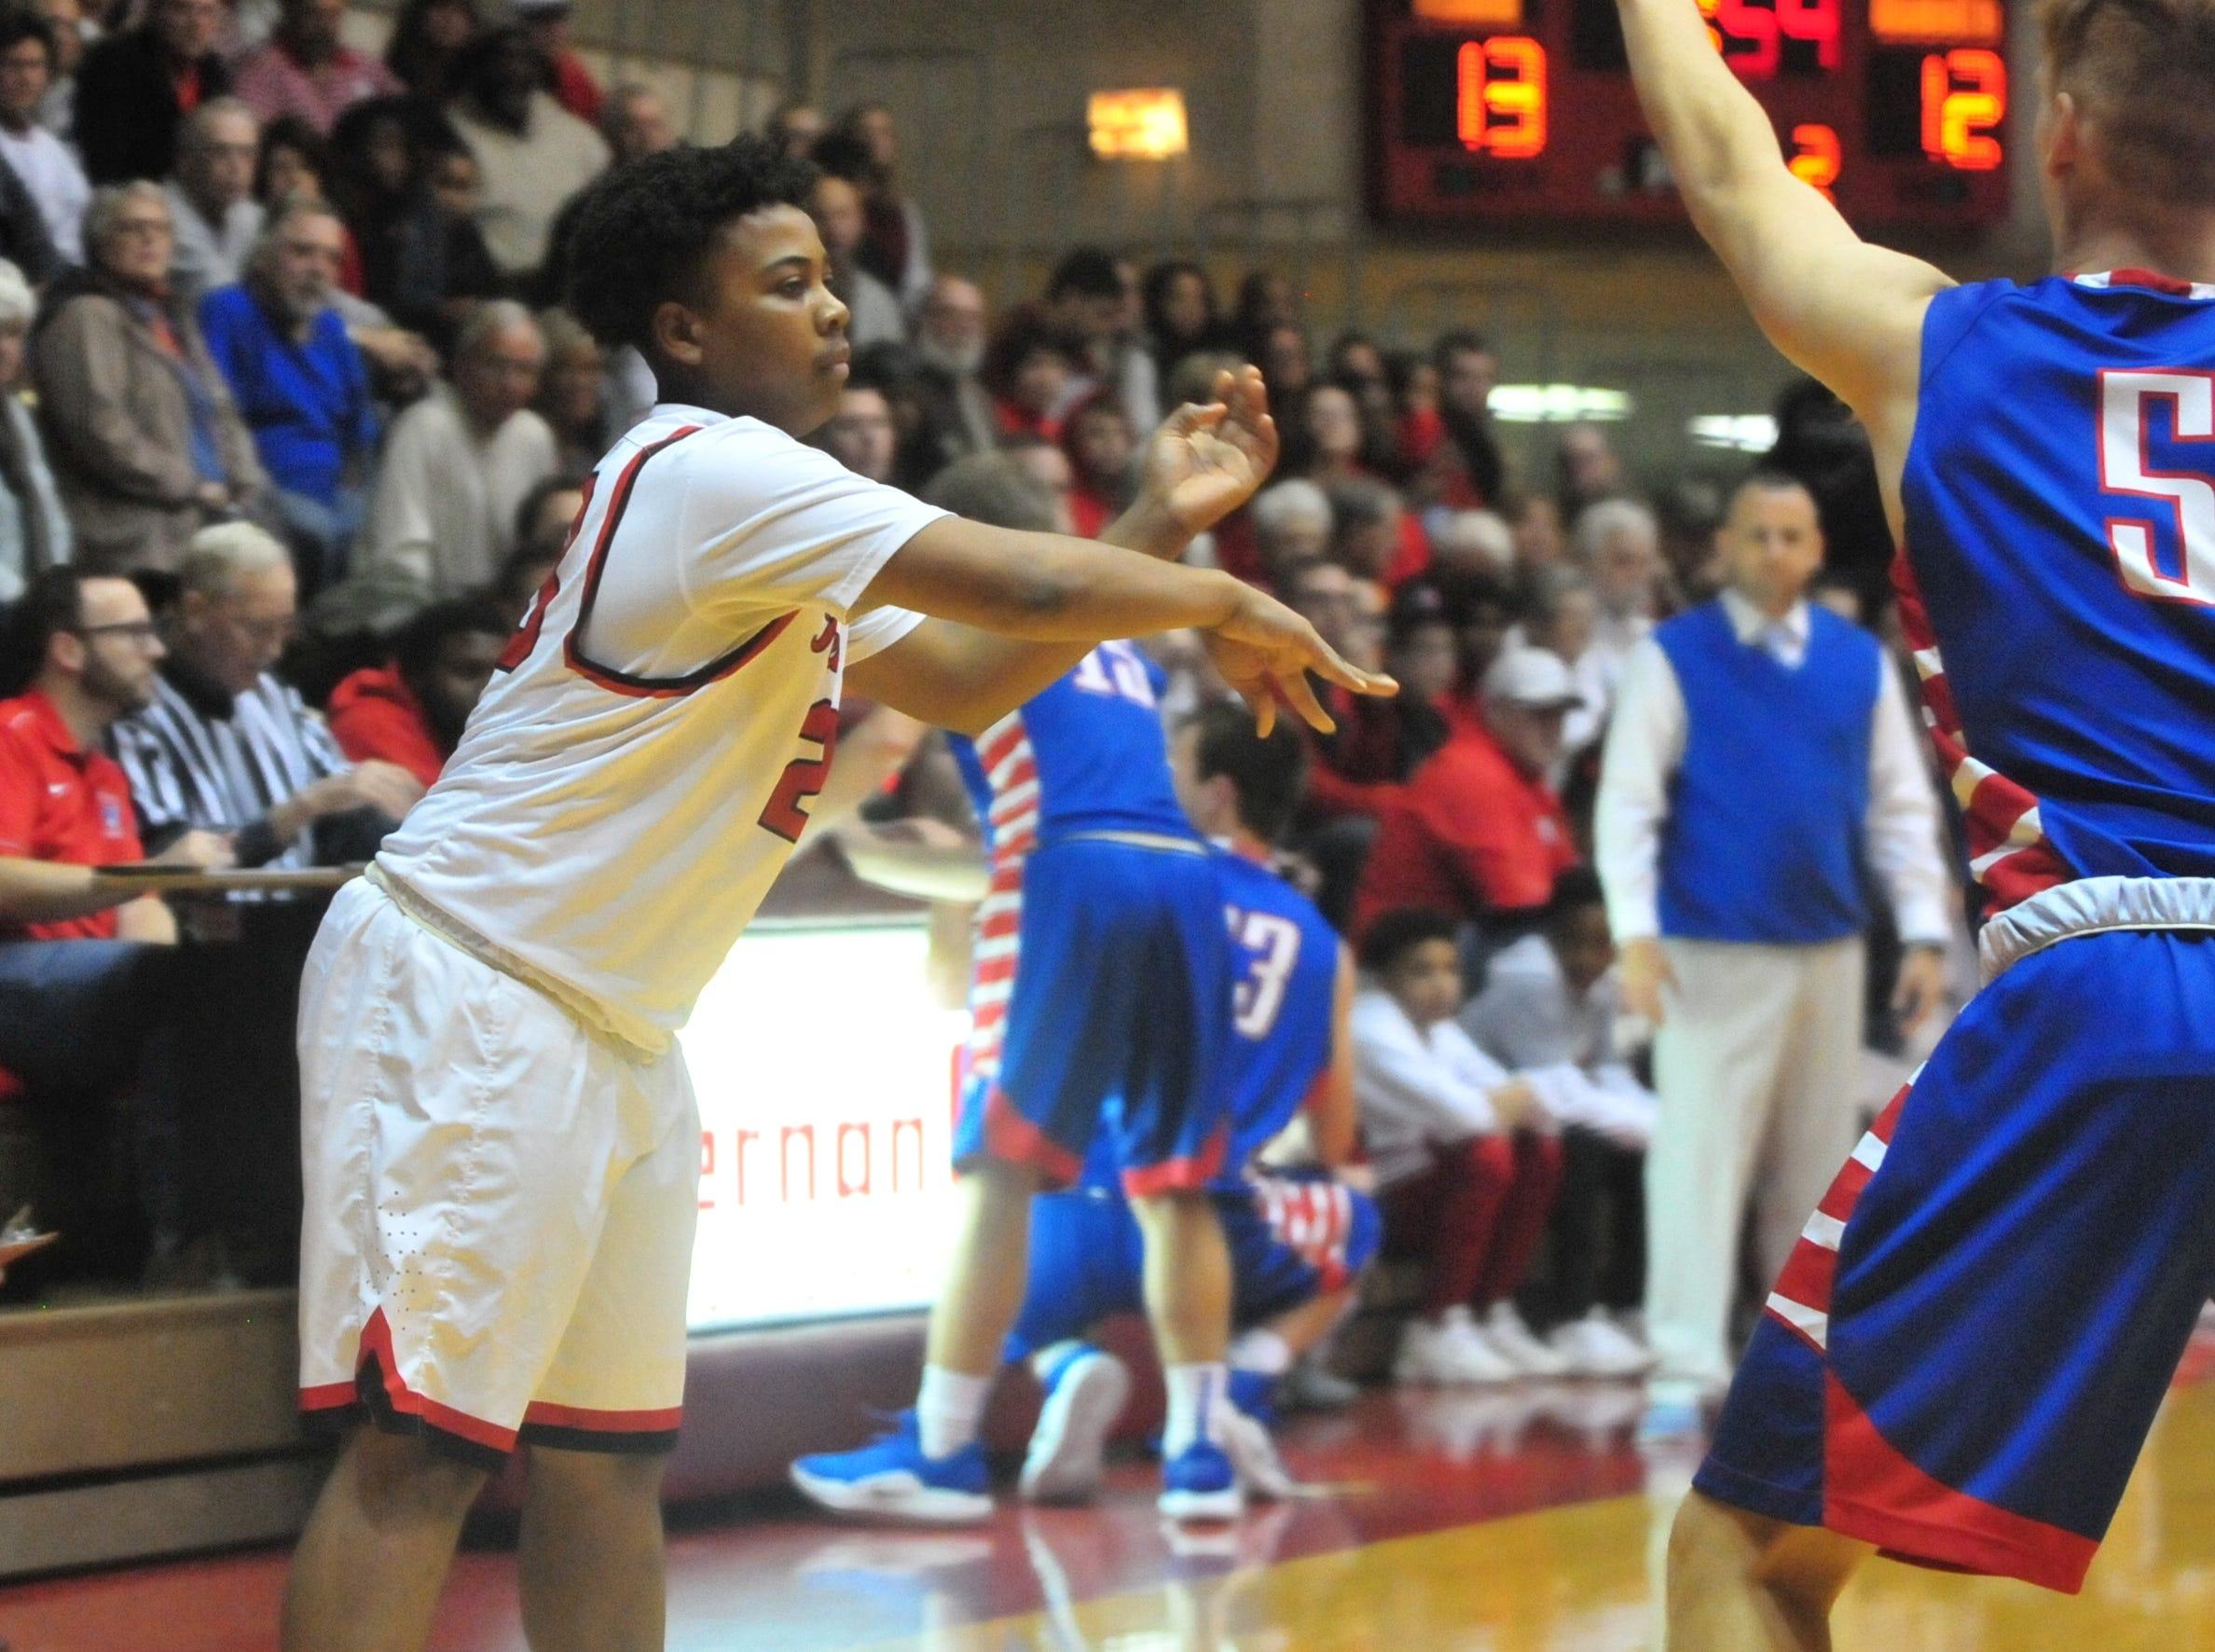 Richmond High School senior Tayjim Deloney (23) makes a pass during a boys basketball game against Jay County Saturday, Nov. 24, 2018 at Richmond High School's Tiernan Center.